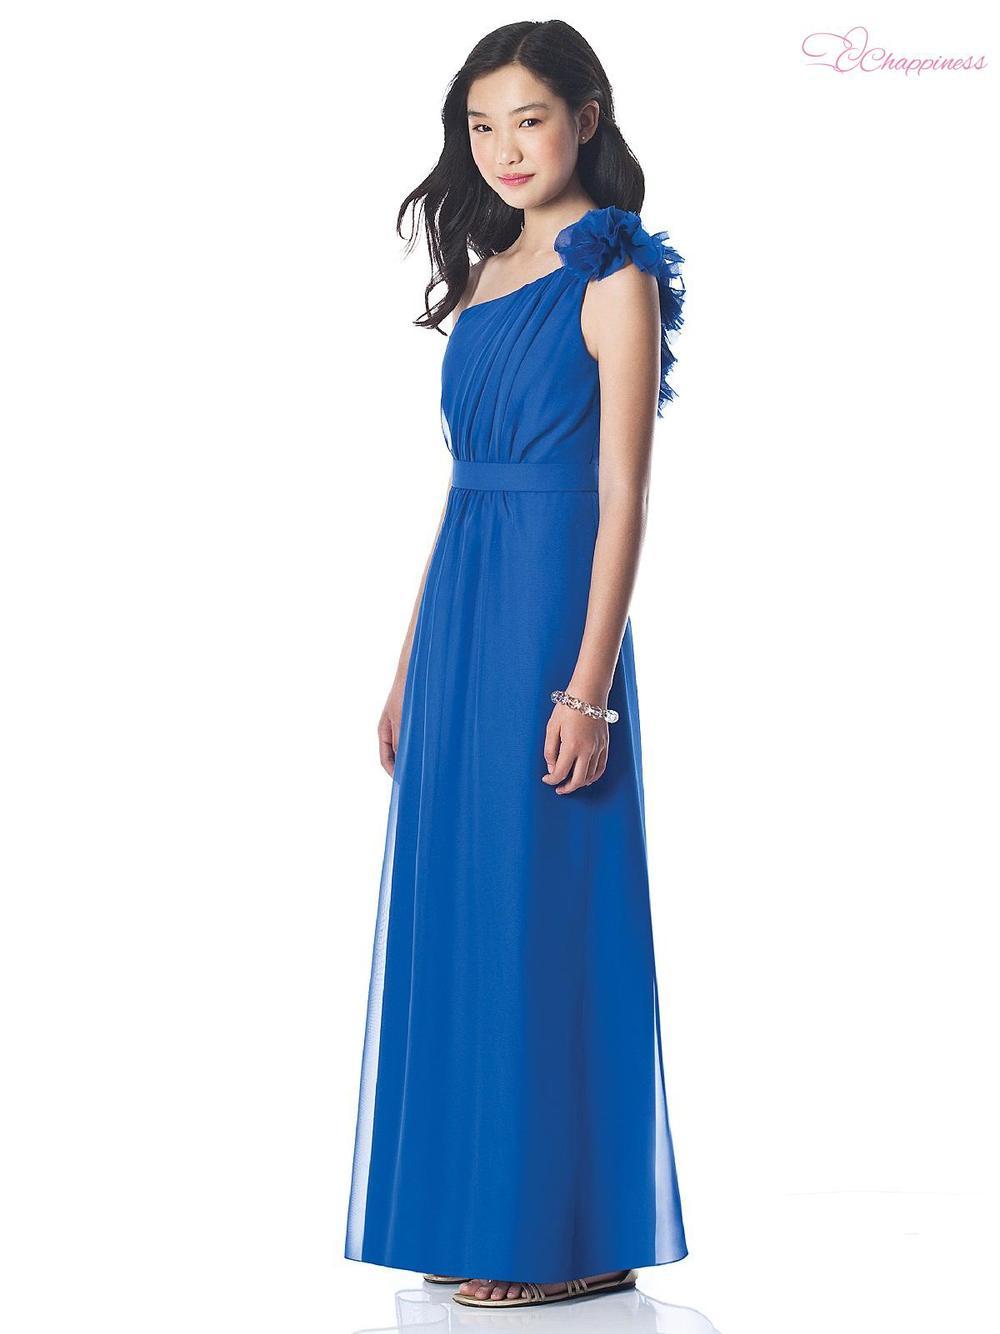 Free Shipping A Line One Shoulder Floor Length Chiffon Flower Communion Dress 20121108211